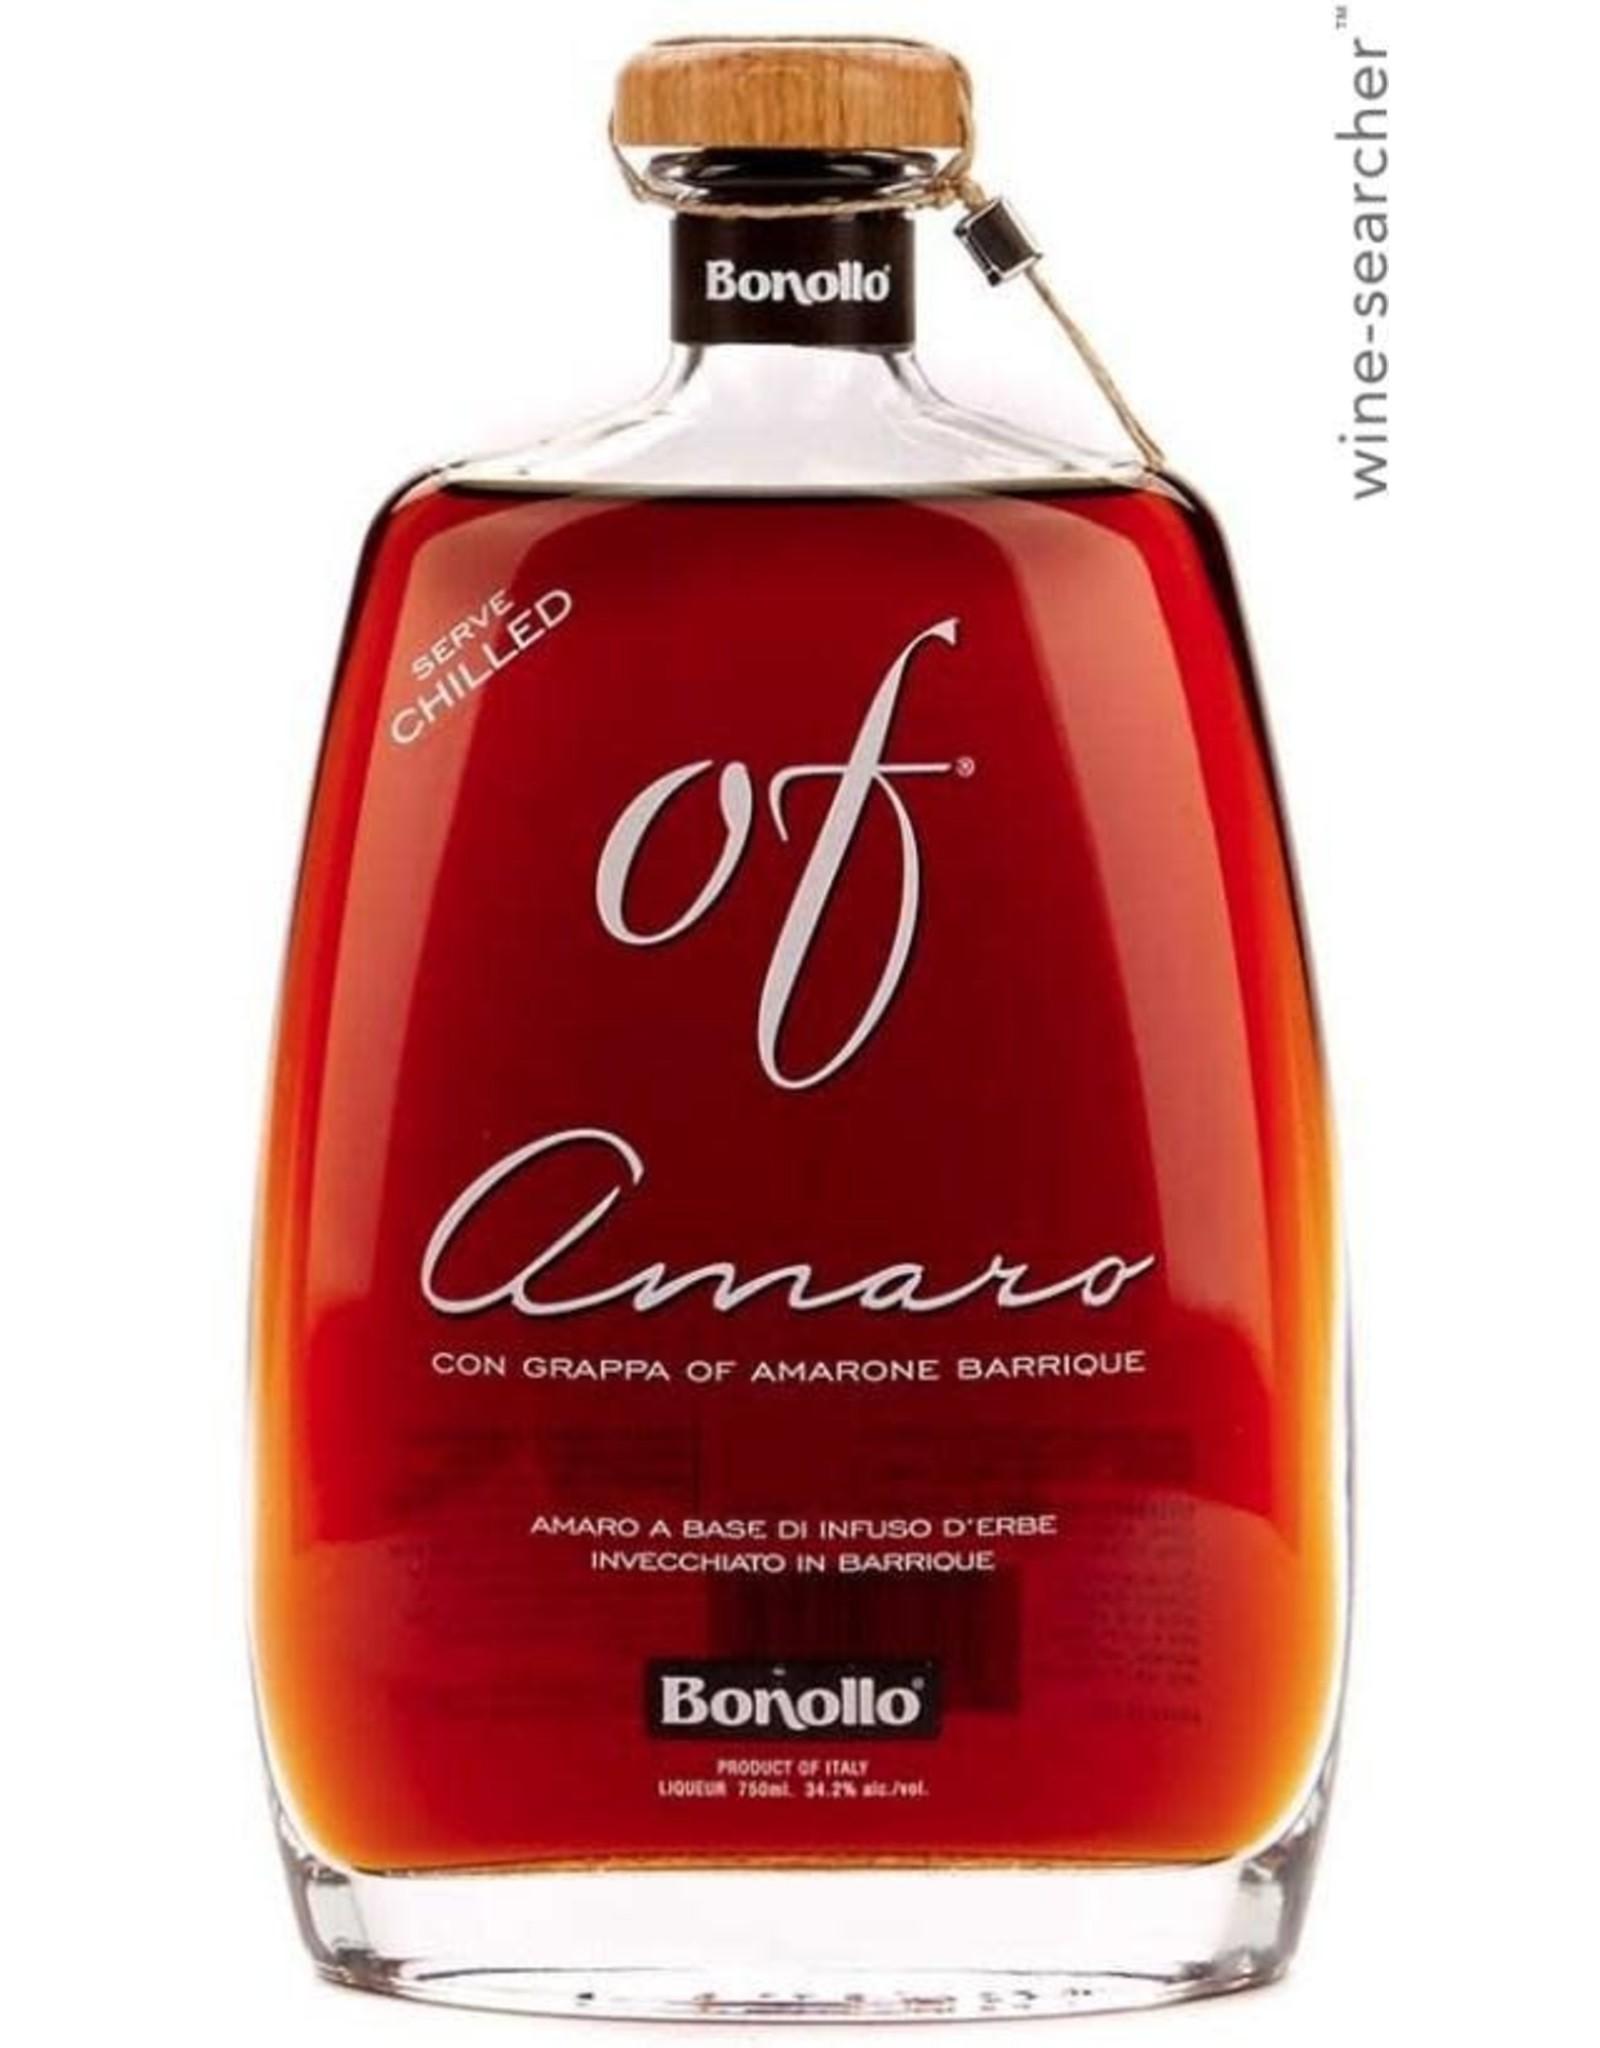 Bonollo Amaro con Grappa of Amarone Barrique